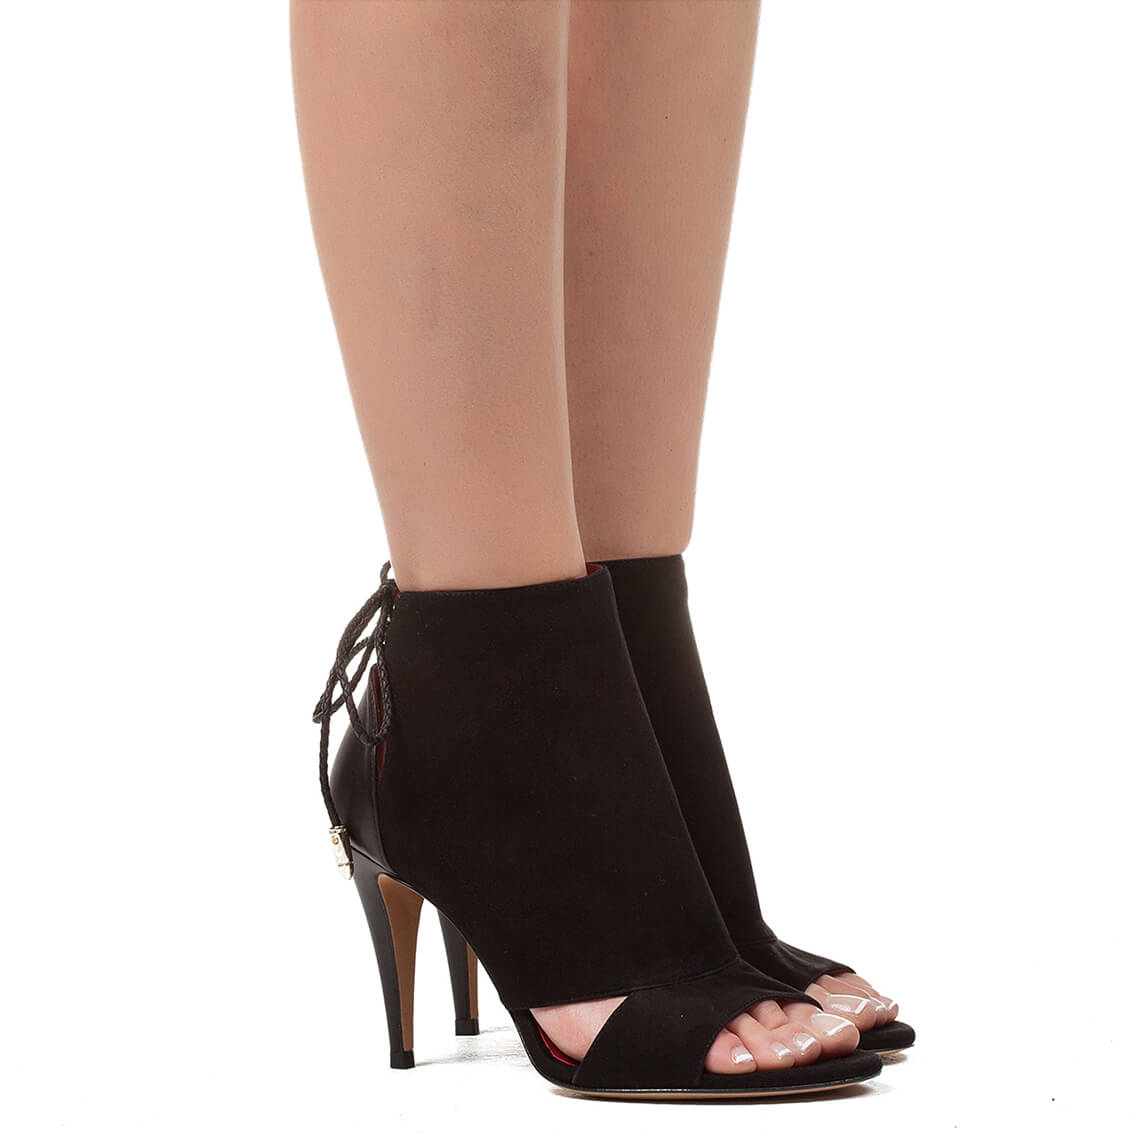 a16f7c37c High heel sandals in black suede - online shoe store Pura Lopez ...